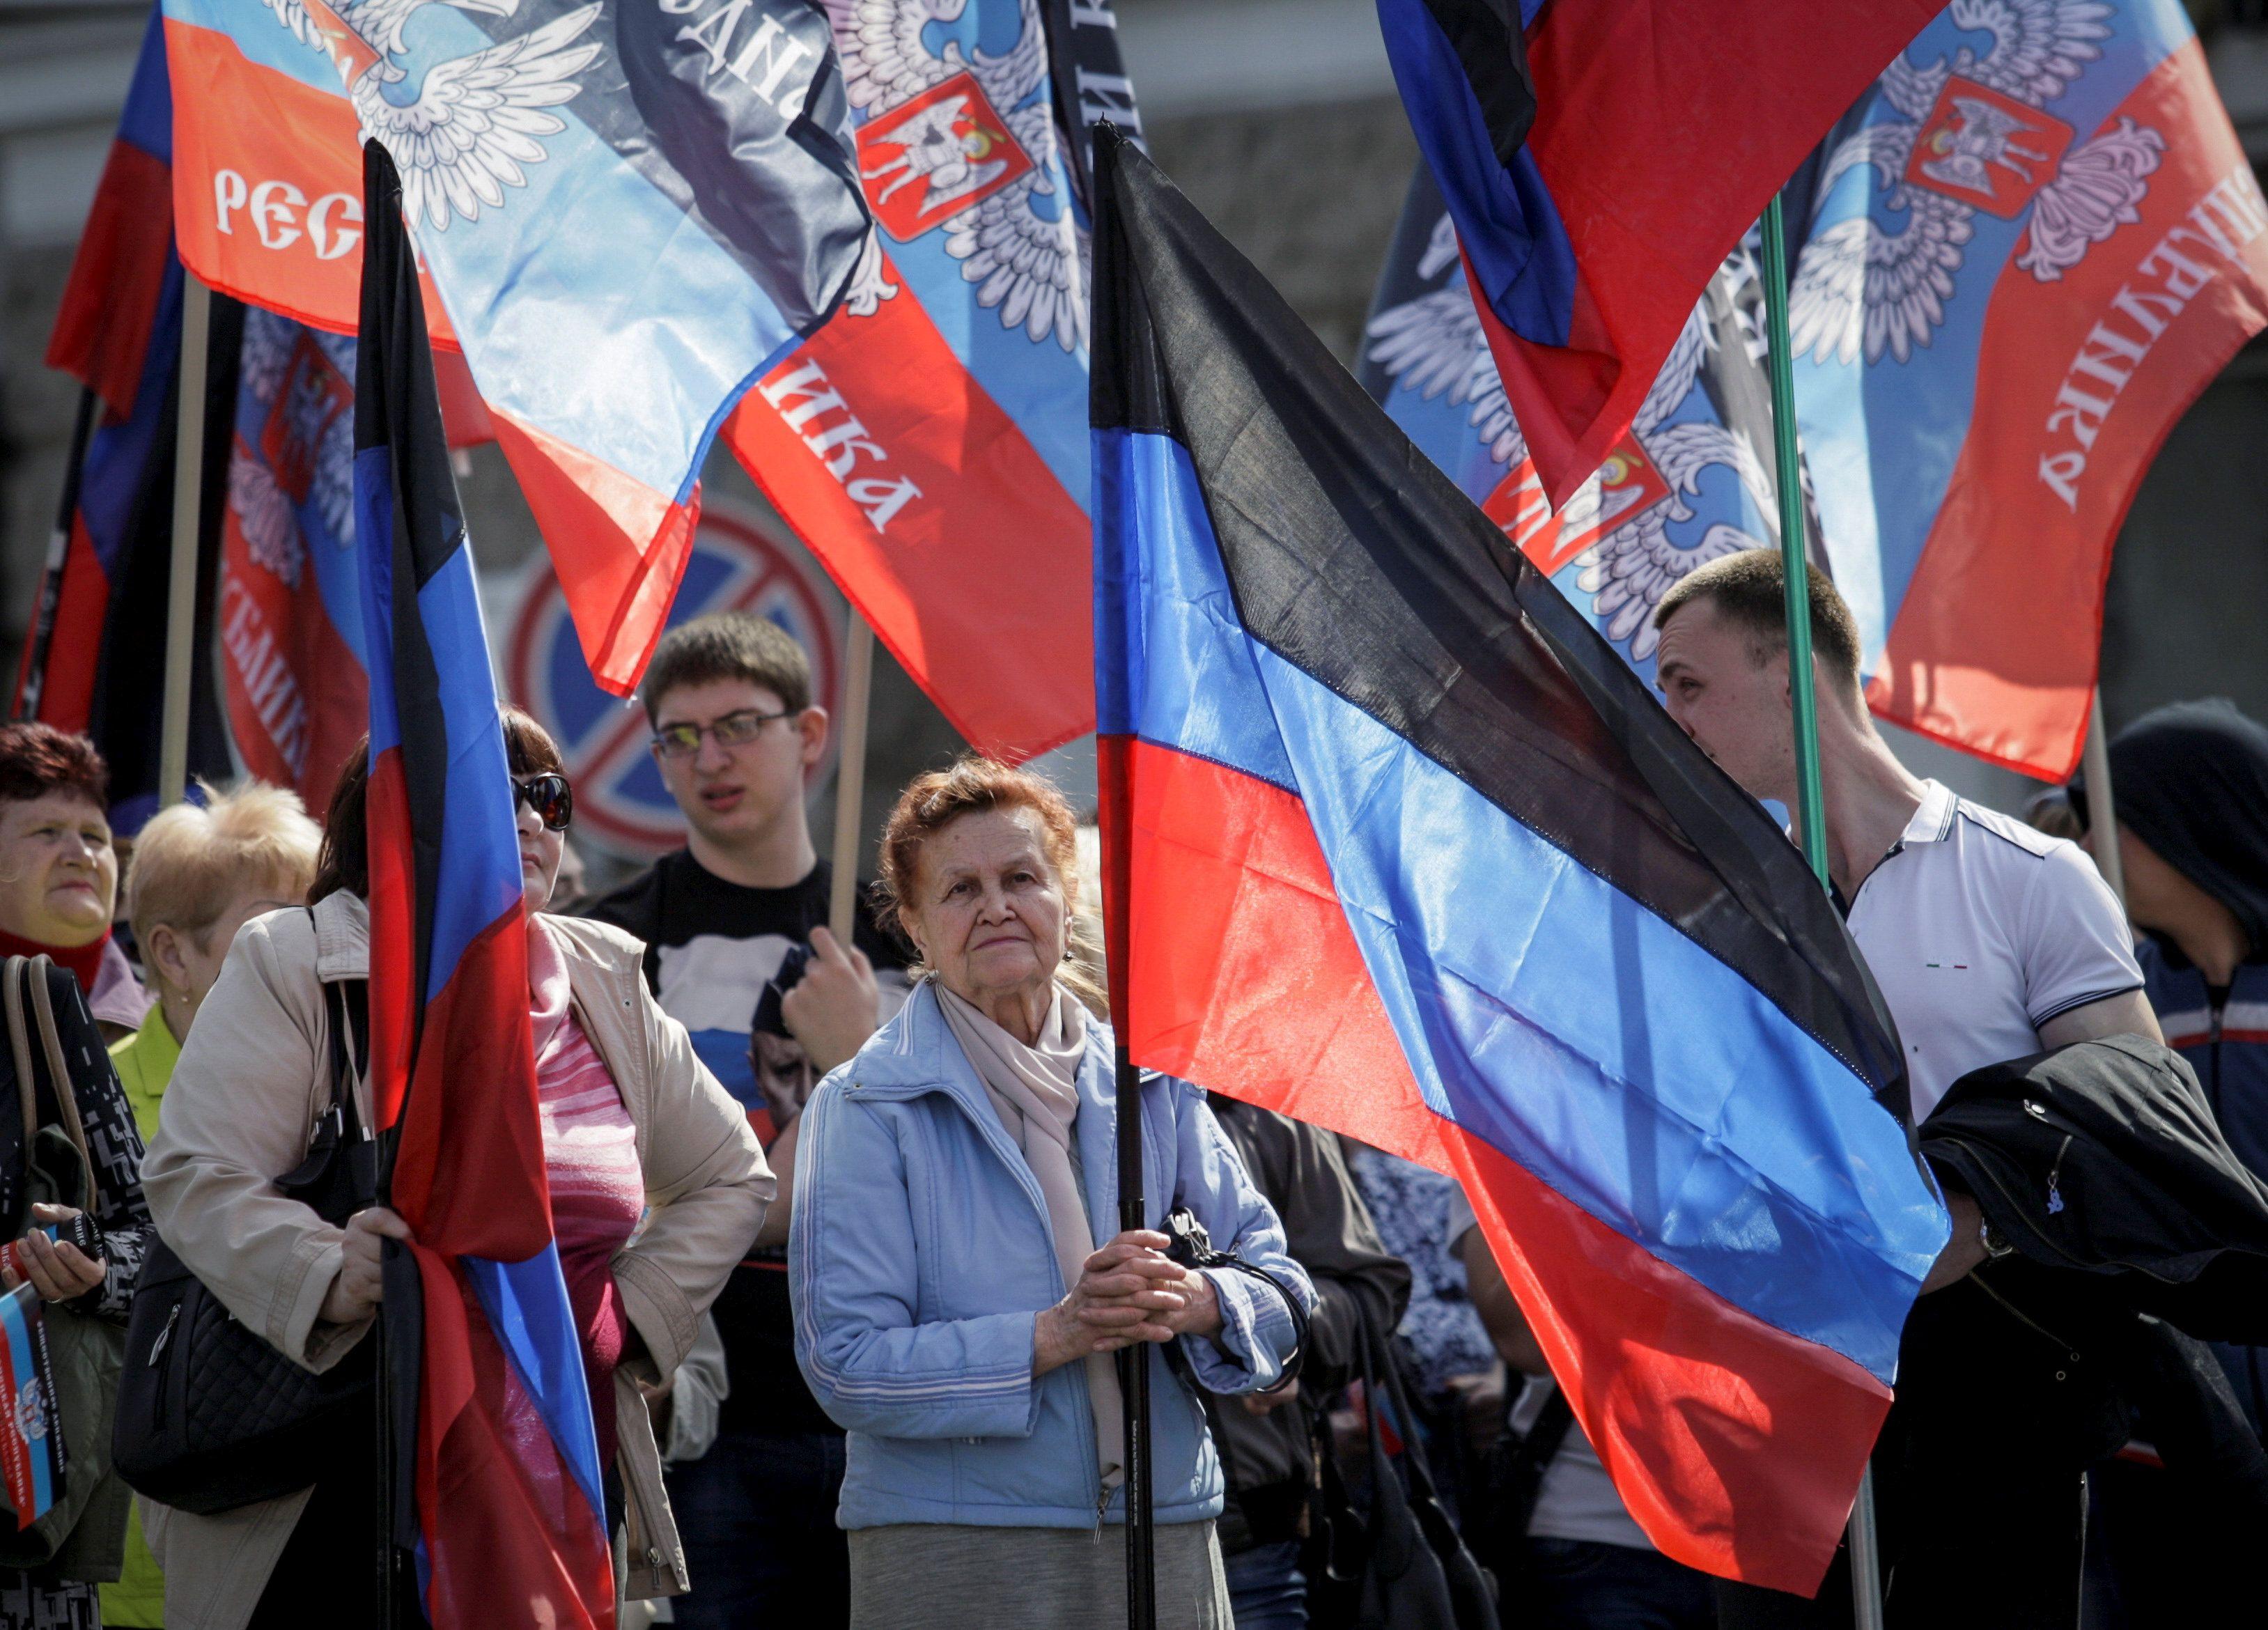 Донецк, сепаратисты, флаги